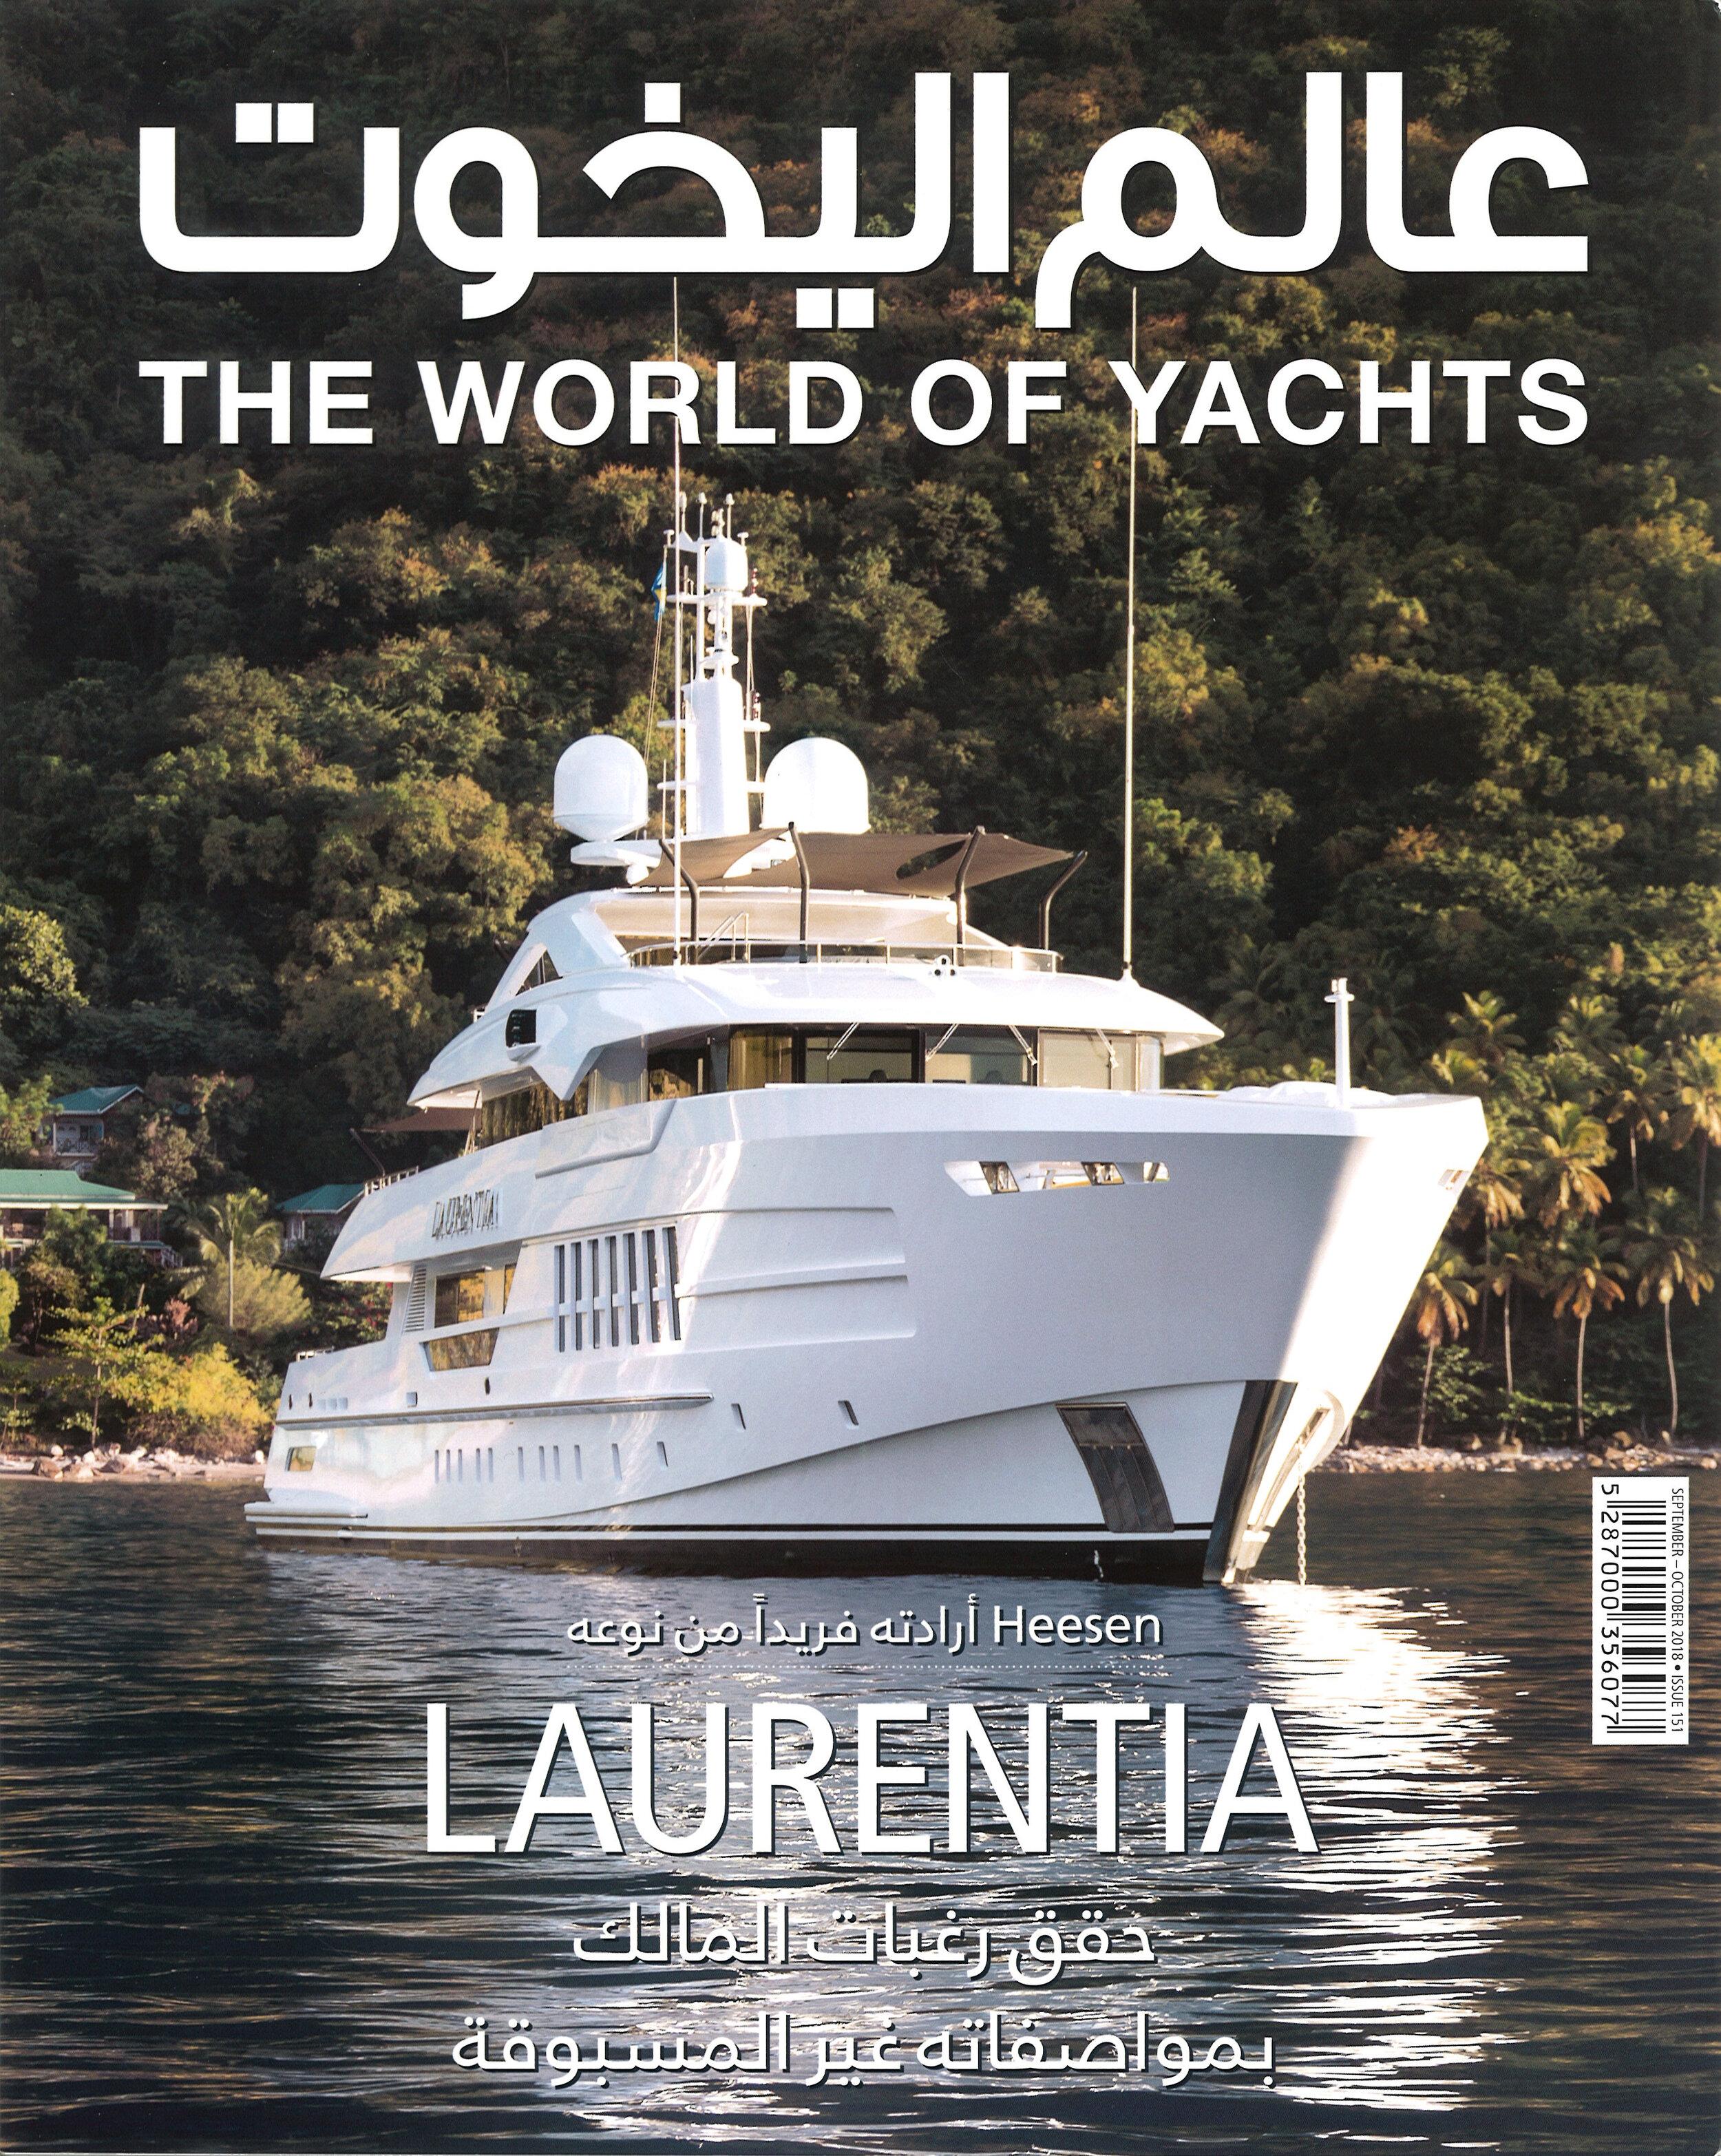 The World of Yachts_Laurentia.jpg